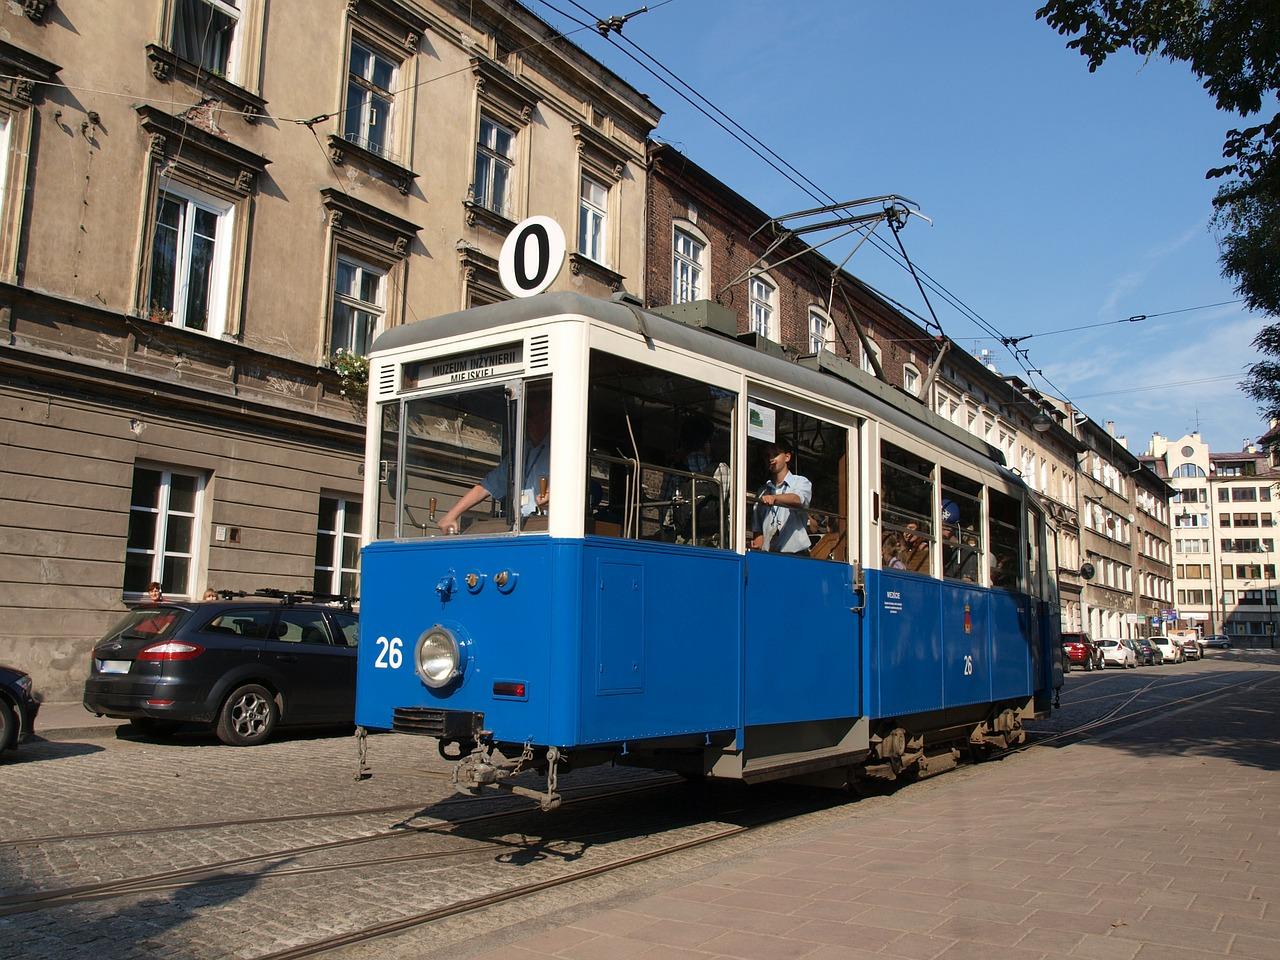 Krakow Public Transport